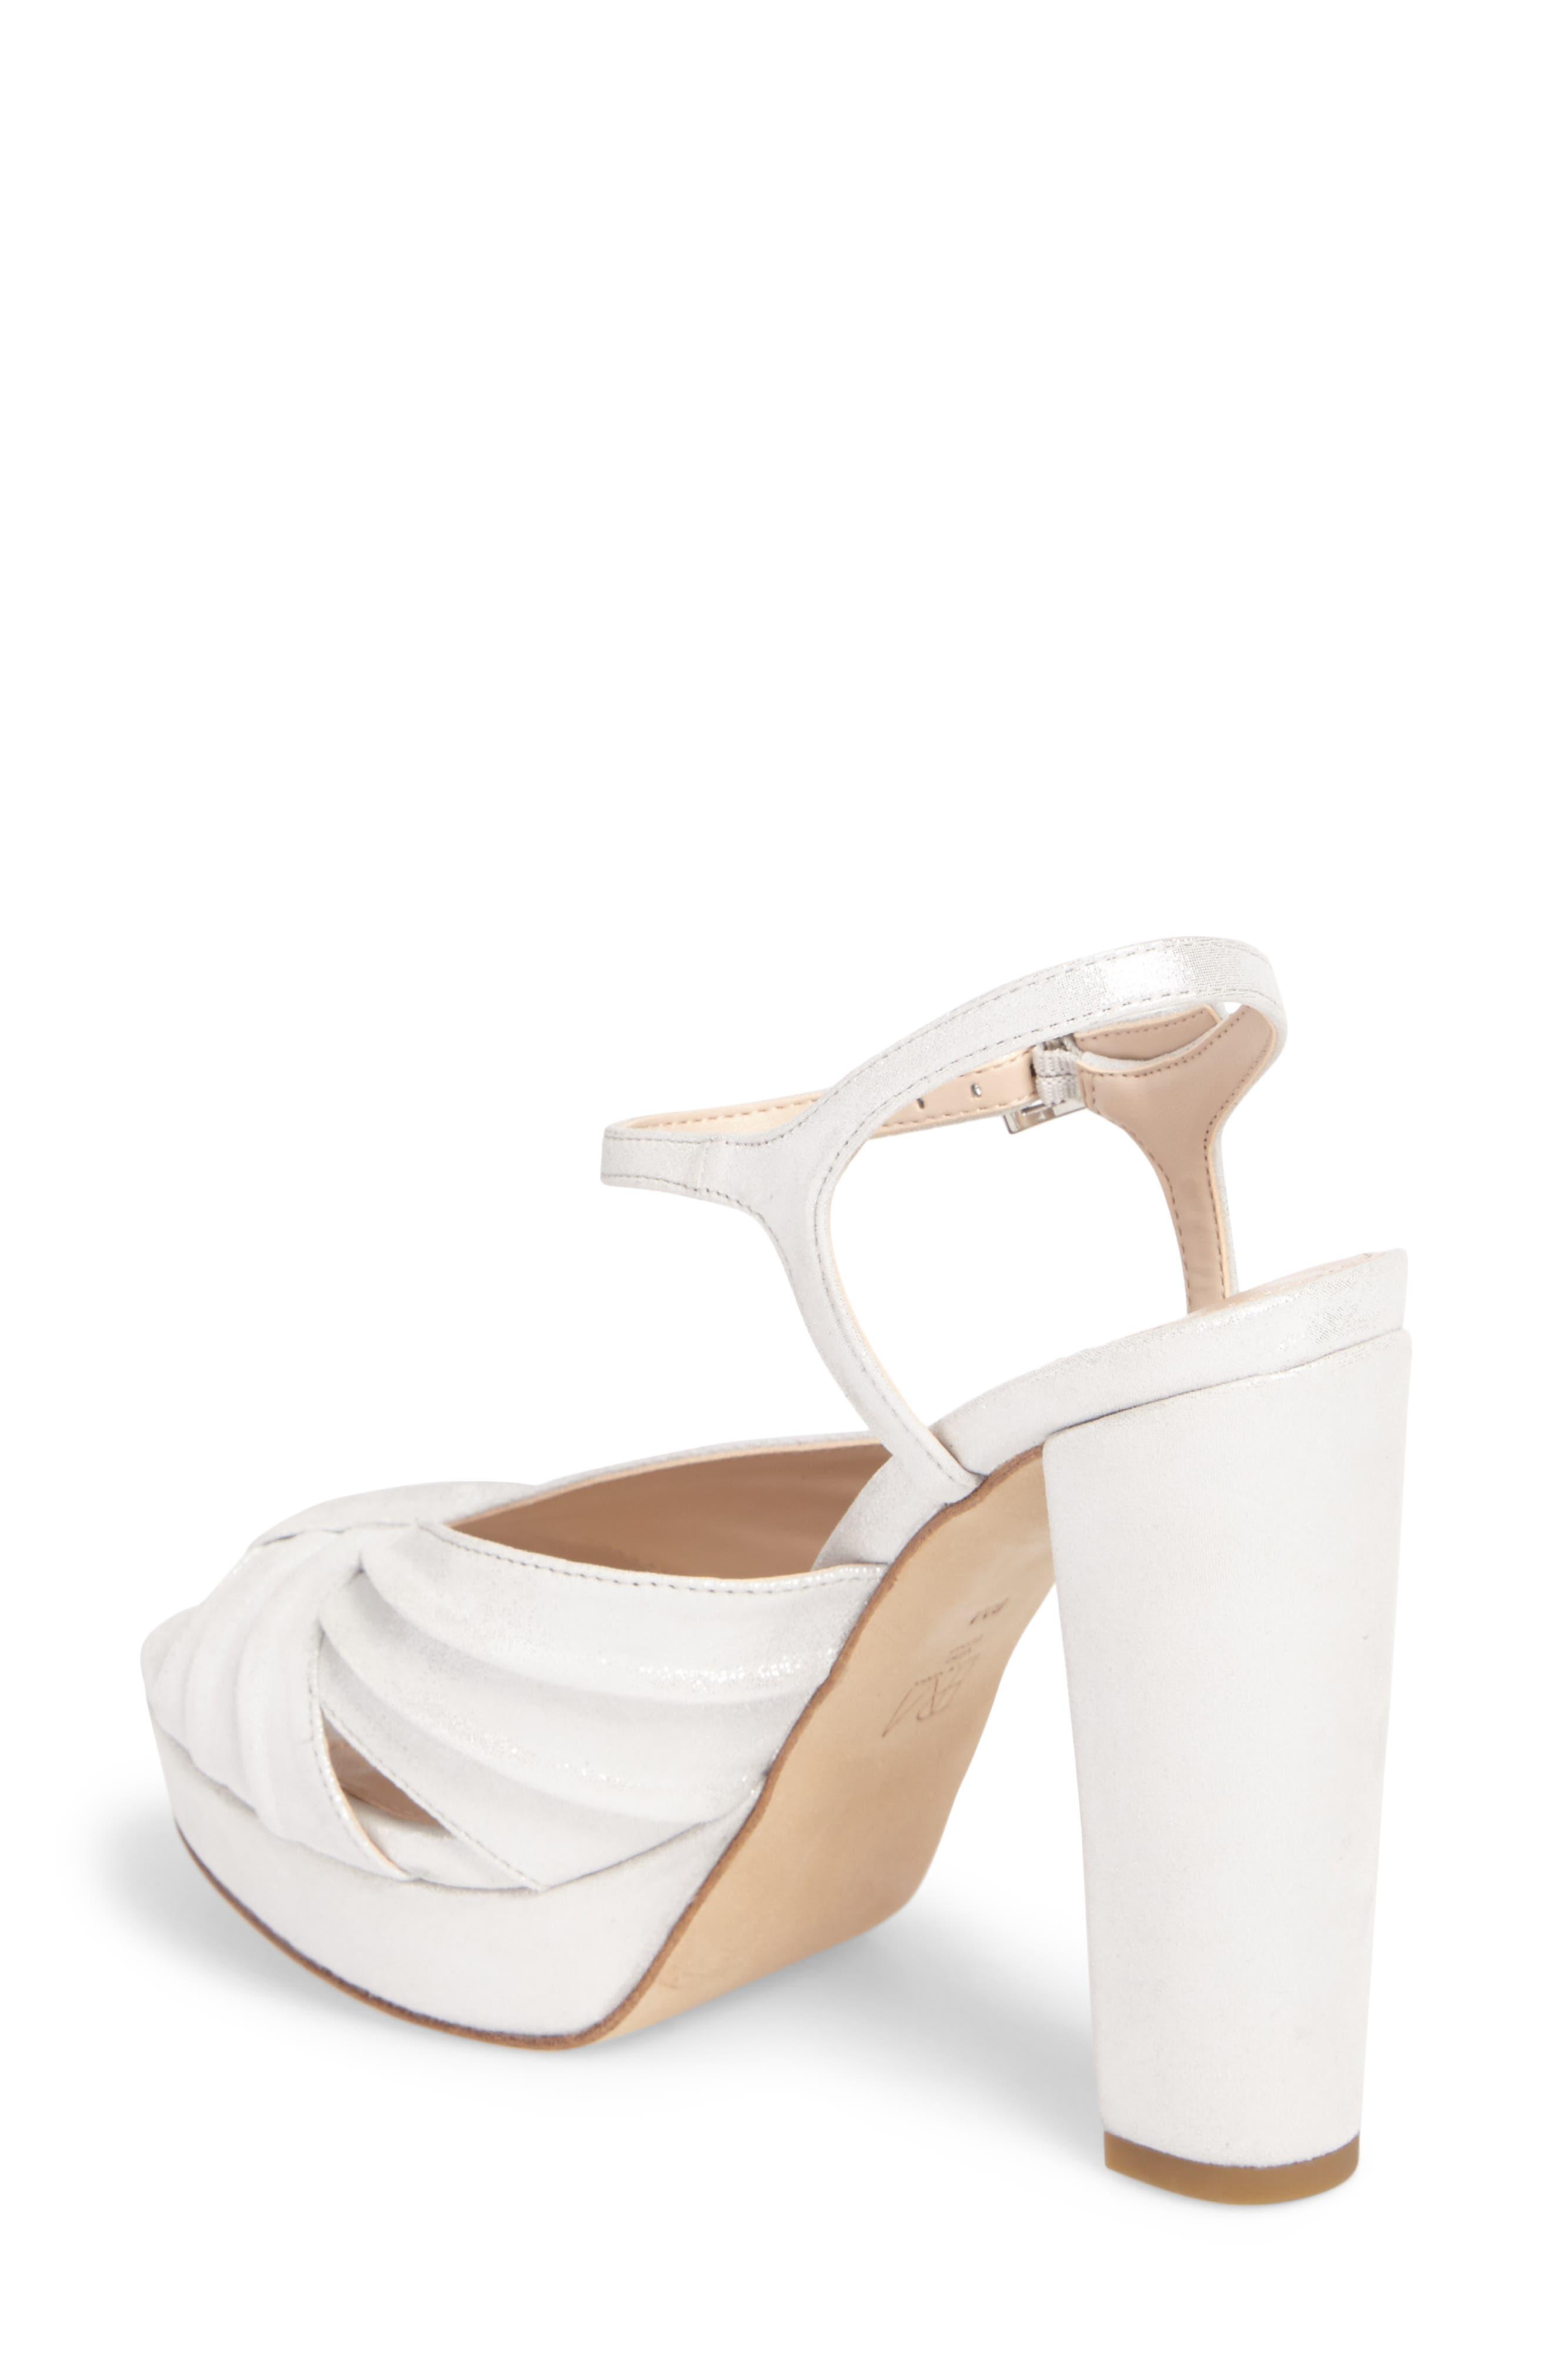 Palm Platform Sandal,                             Alternate thumbnail 2, color,                             Silver Leather